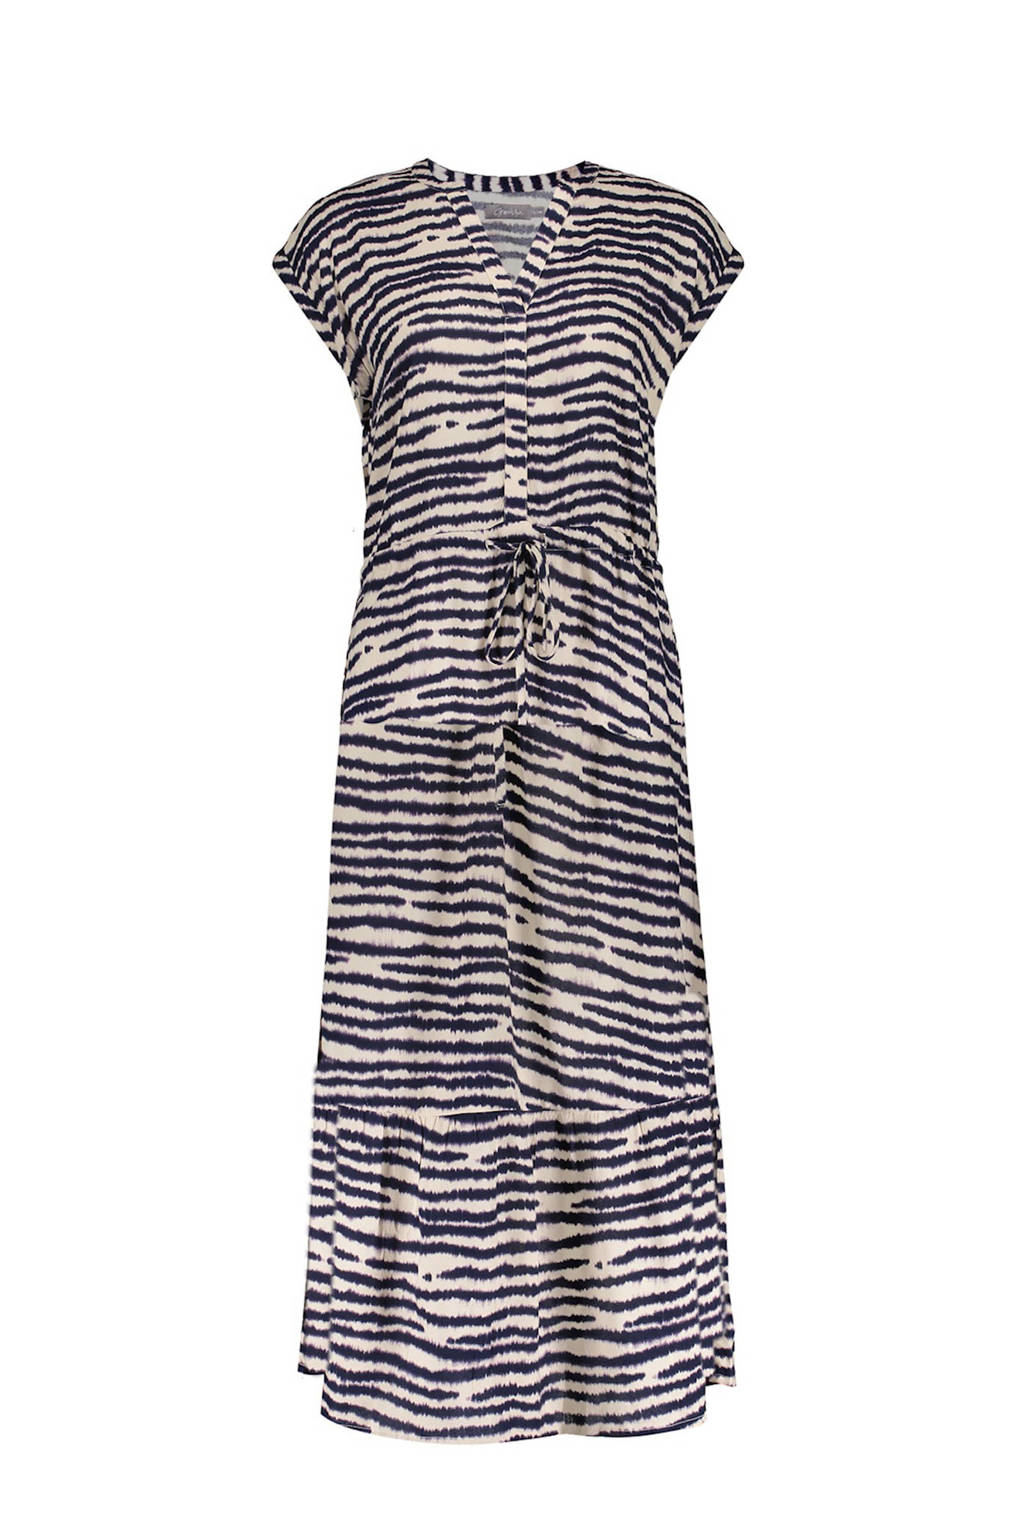 Geisha maxi jurk met zebraprint en volant zand/donkerblauw